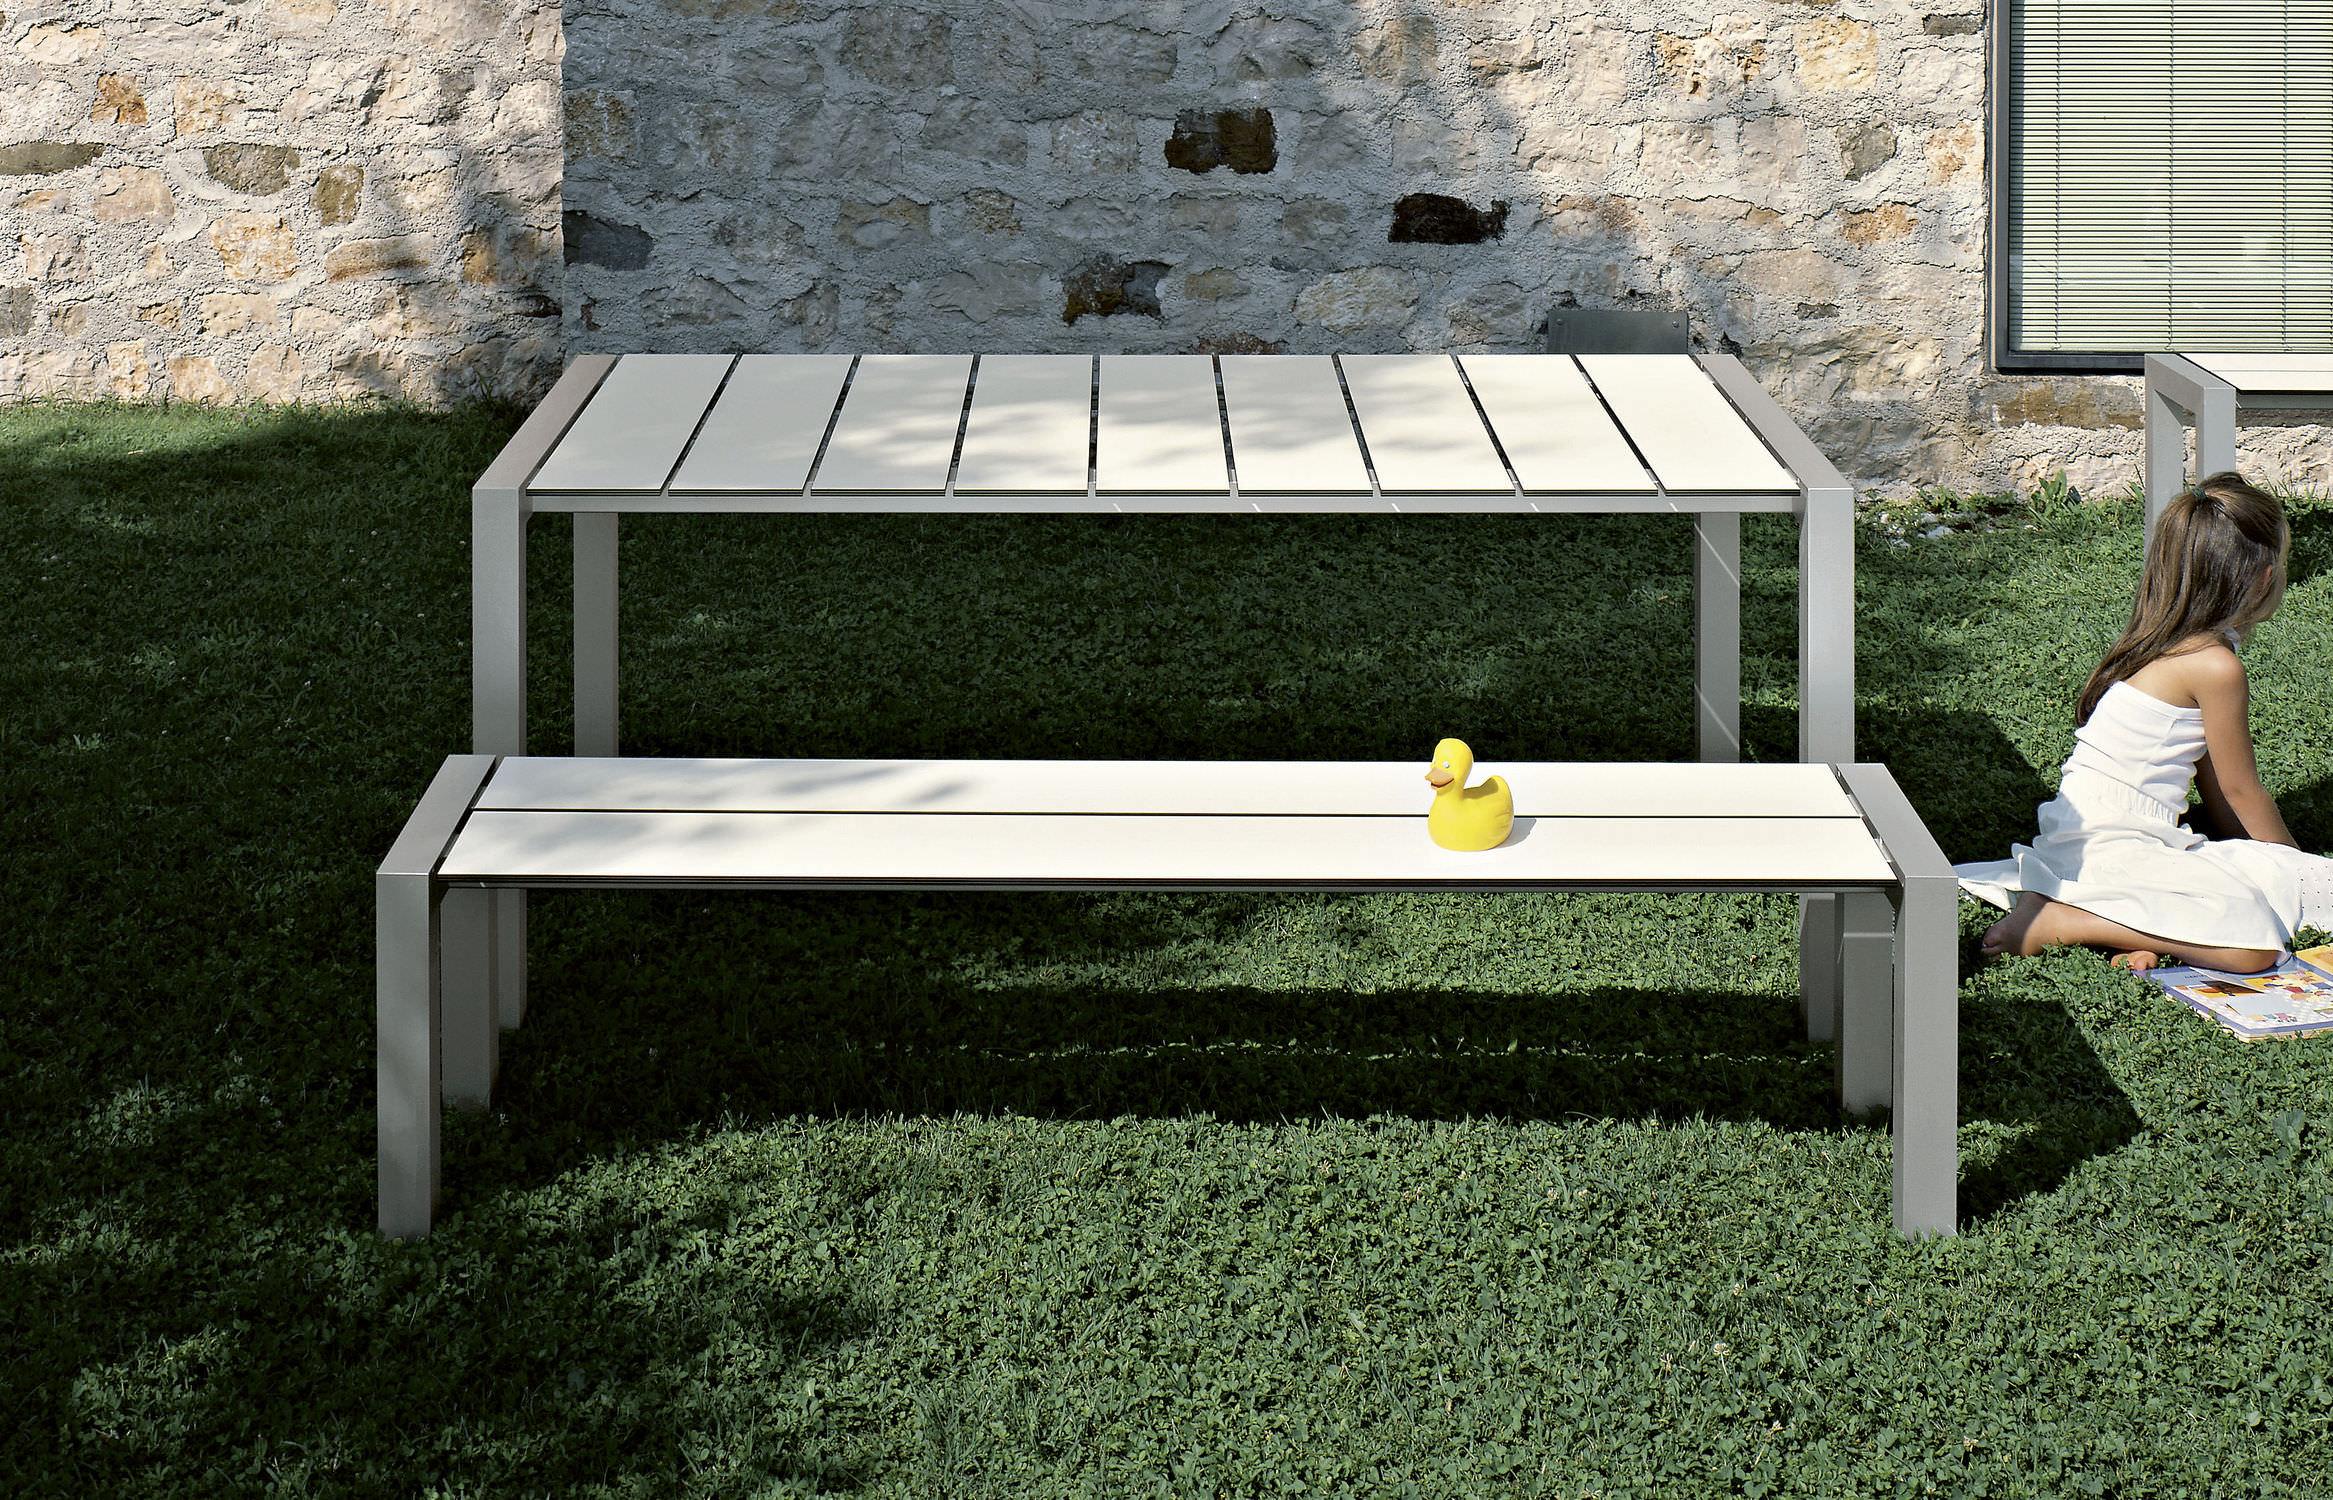 Outdoor furniture garden bench commercial metal outdoor furniture - Garden Bench Contemporary Metal Sushi Bench By Bartoli Design